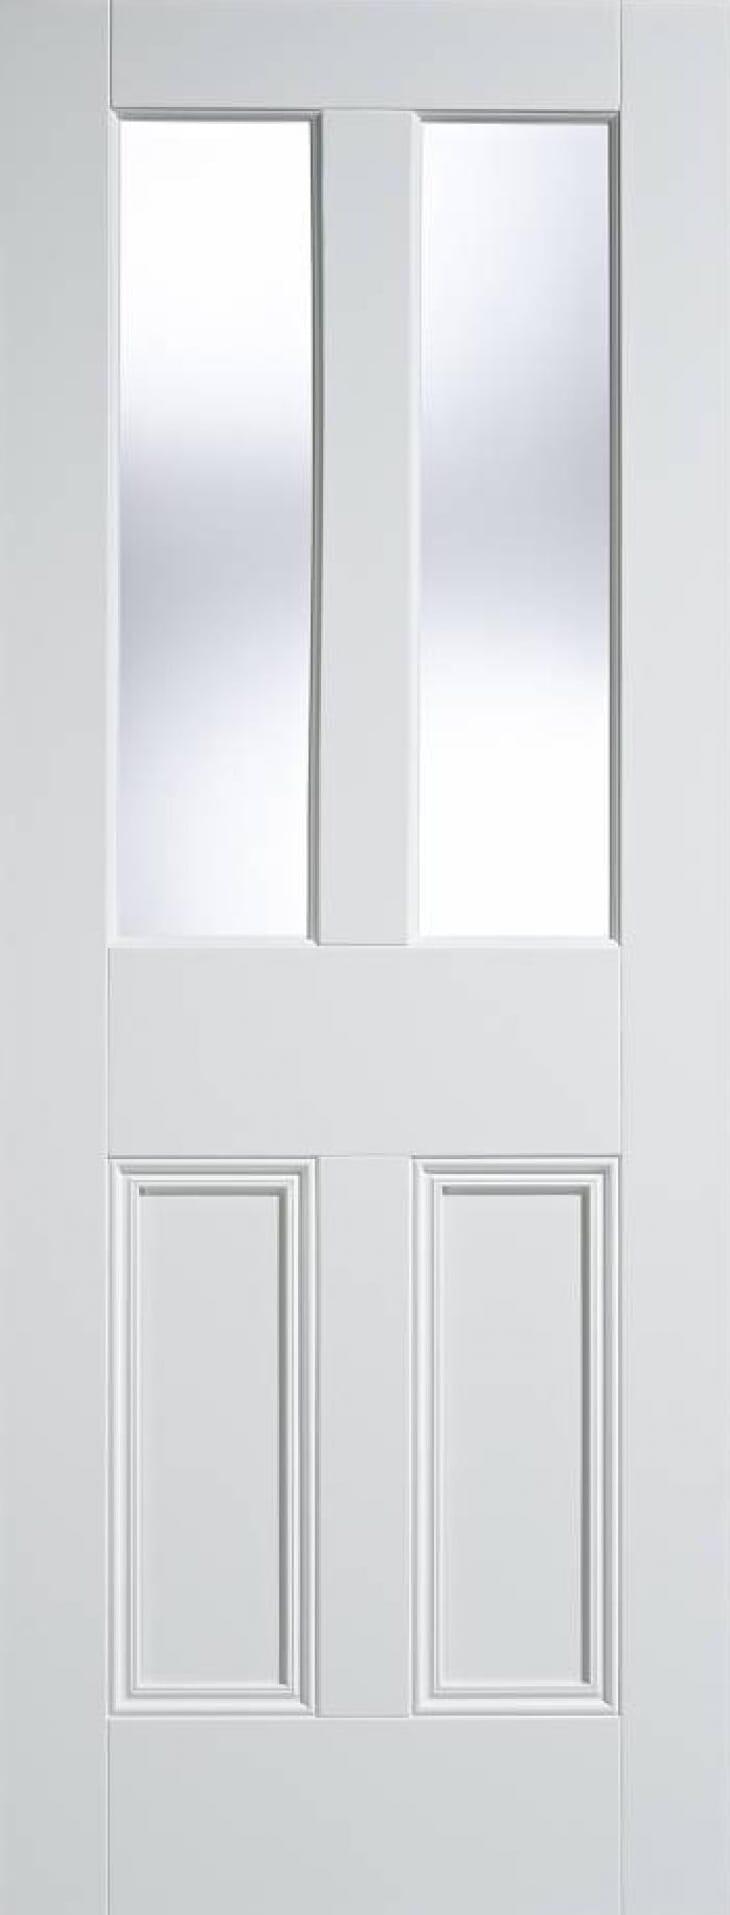 Malton White Unglazed Image